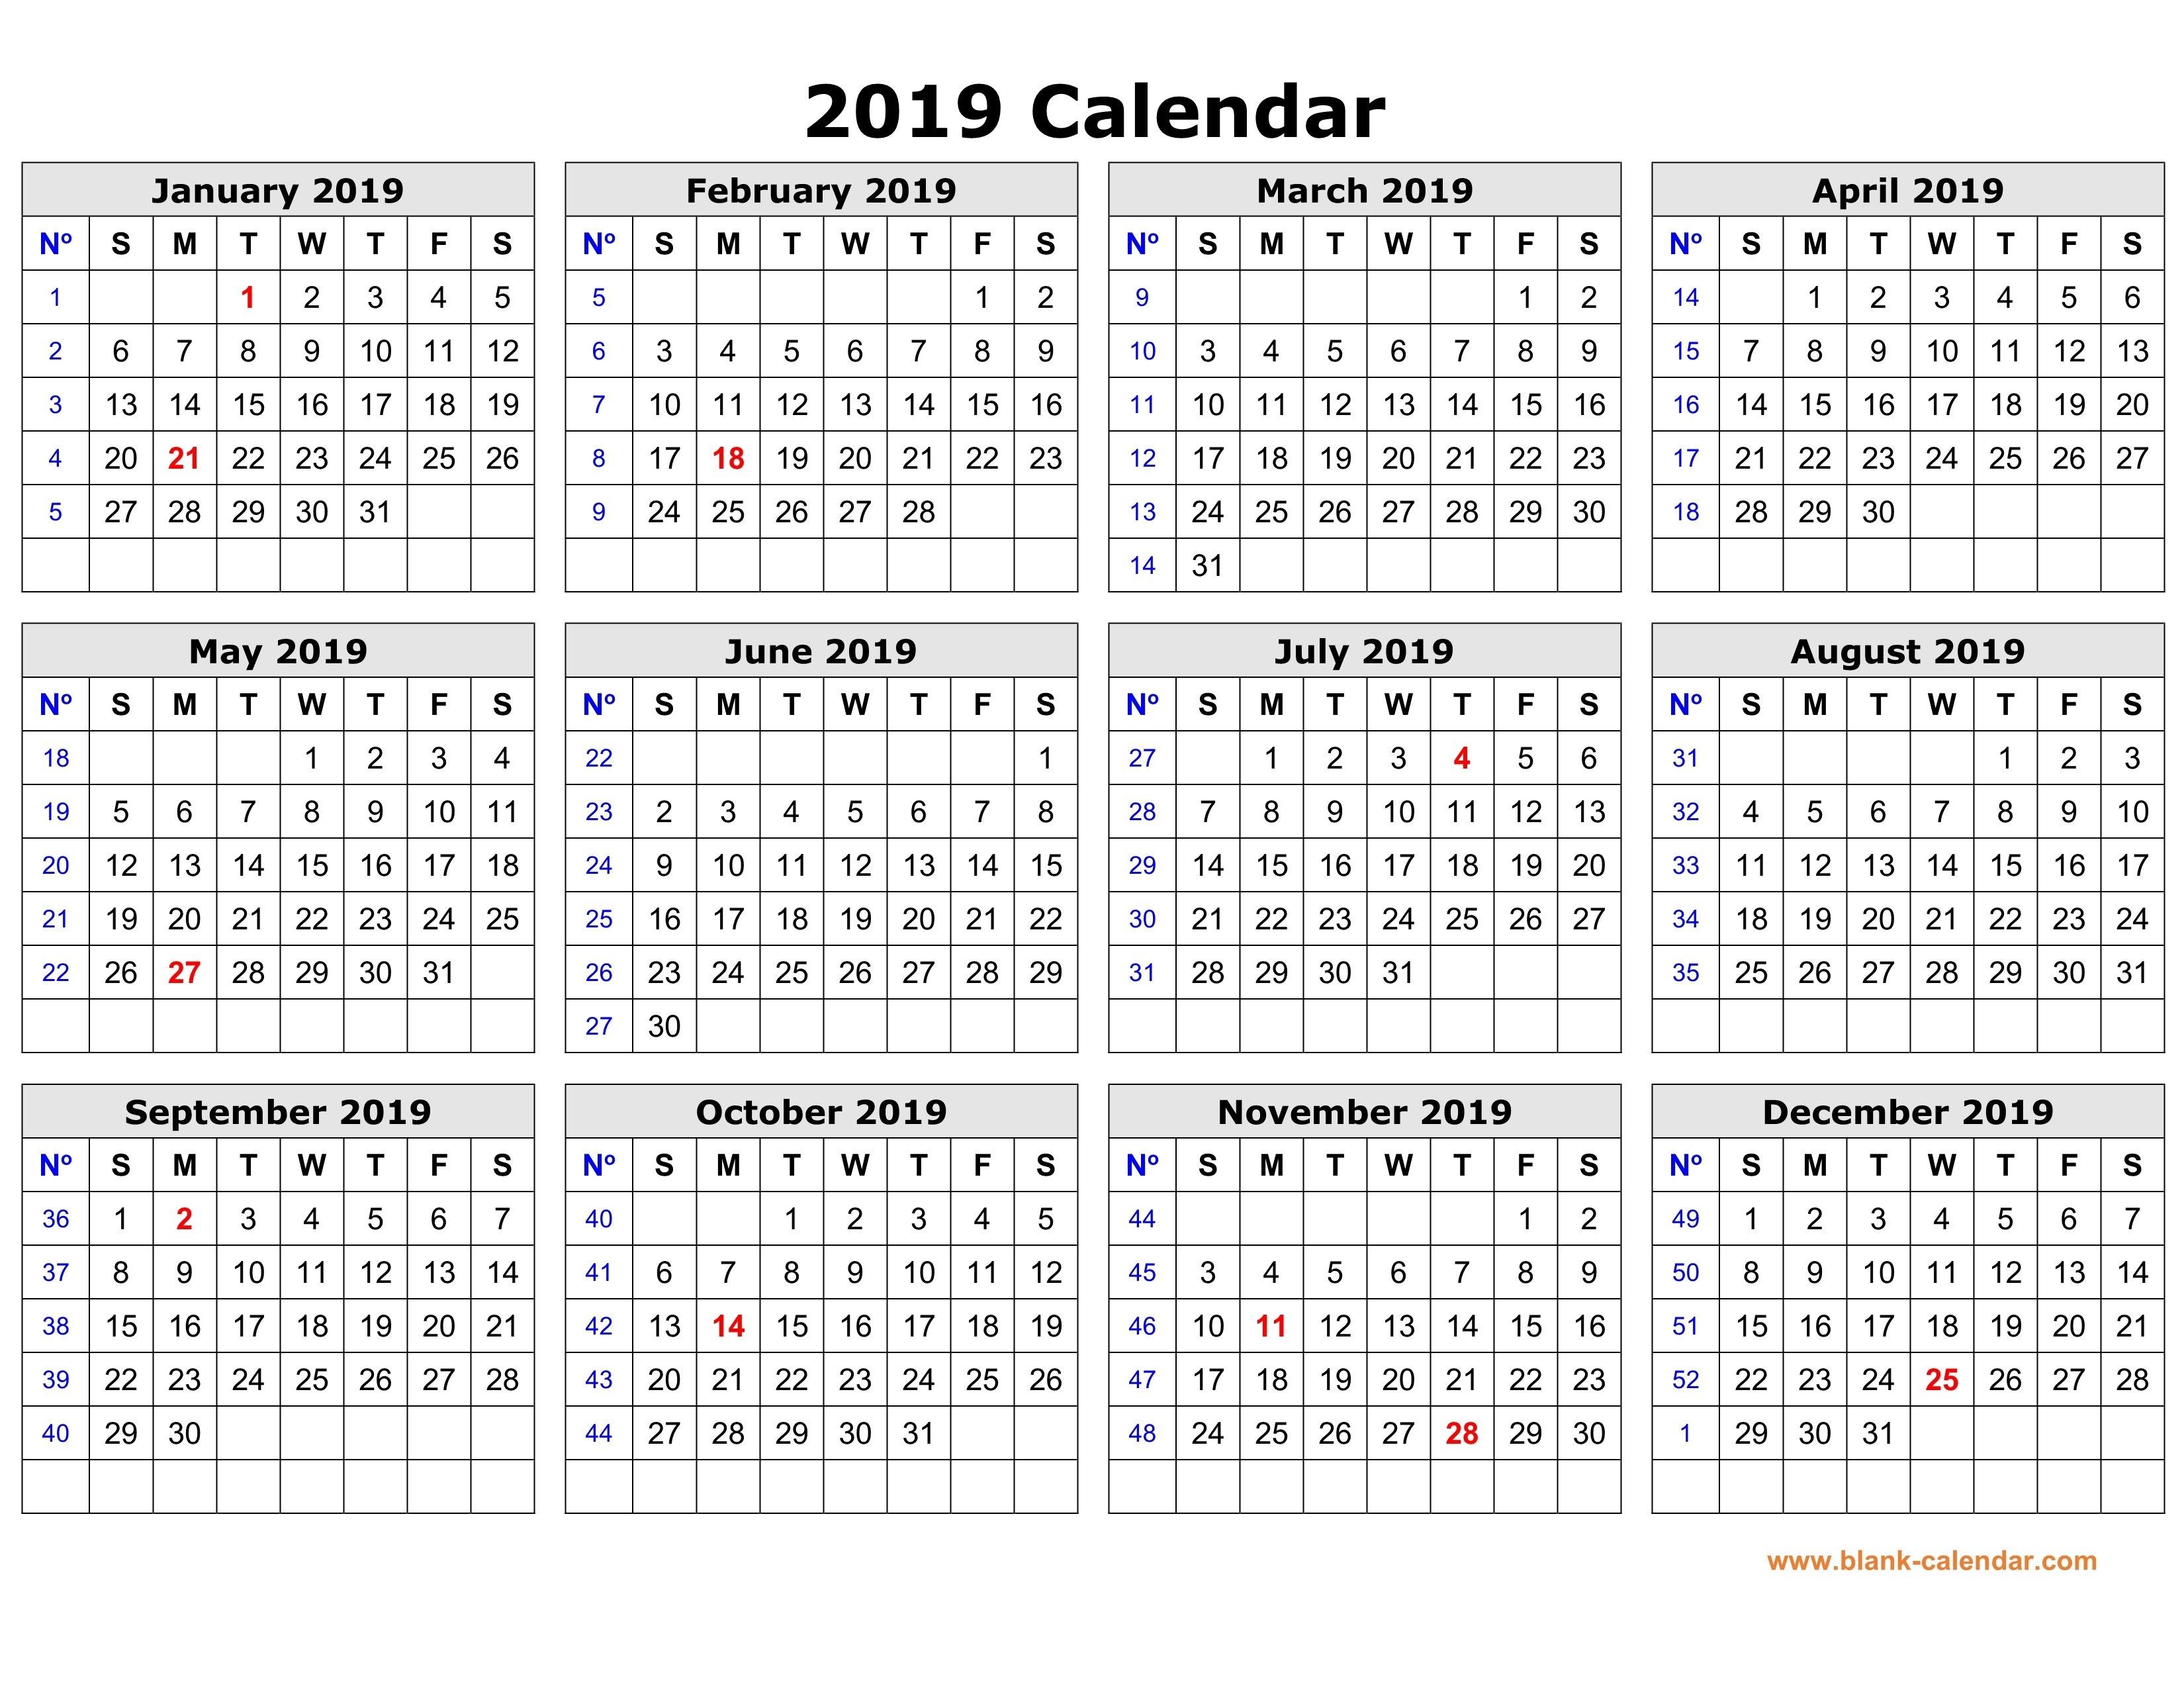 Free Download Printable Calendar 2019 In One Page, Clean Design. Calendar 2019 Print